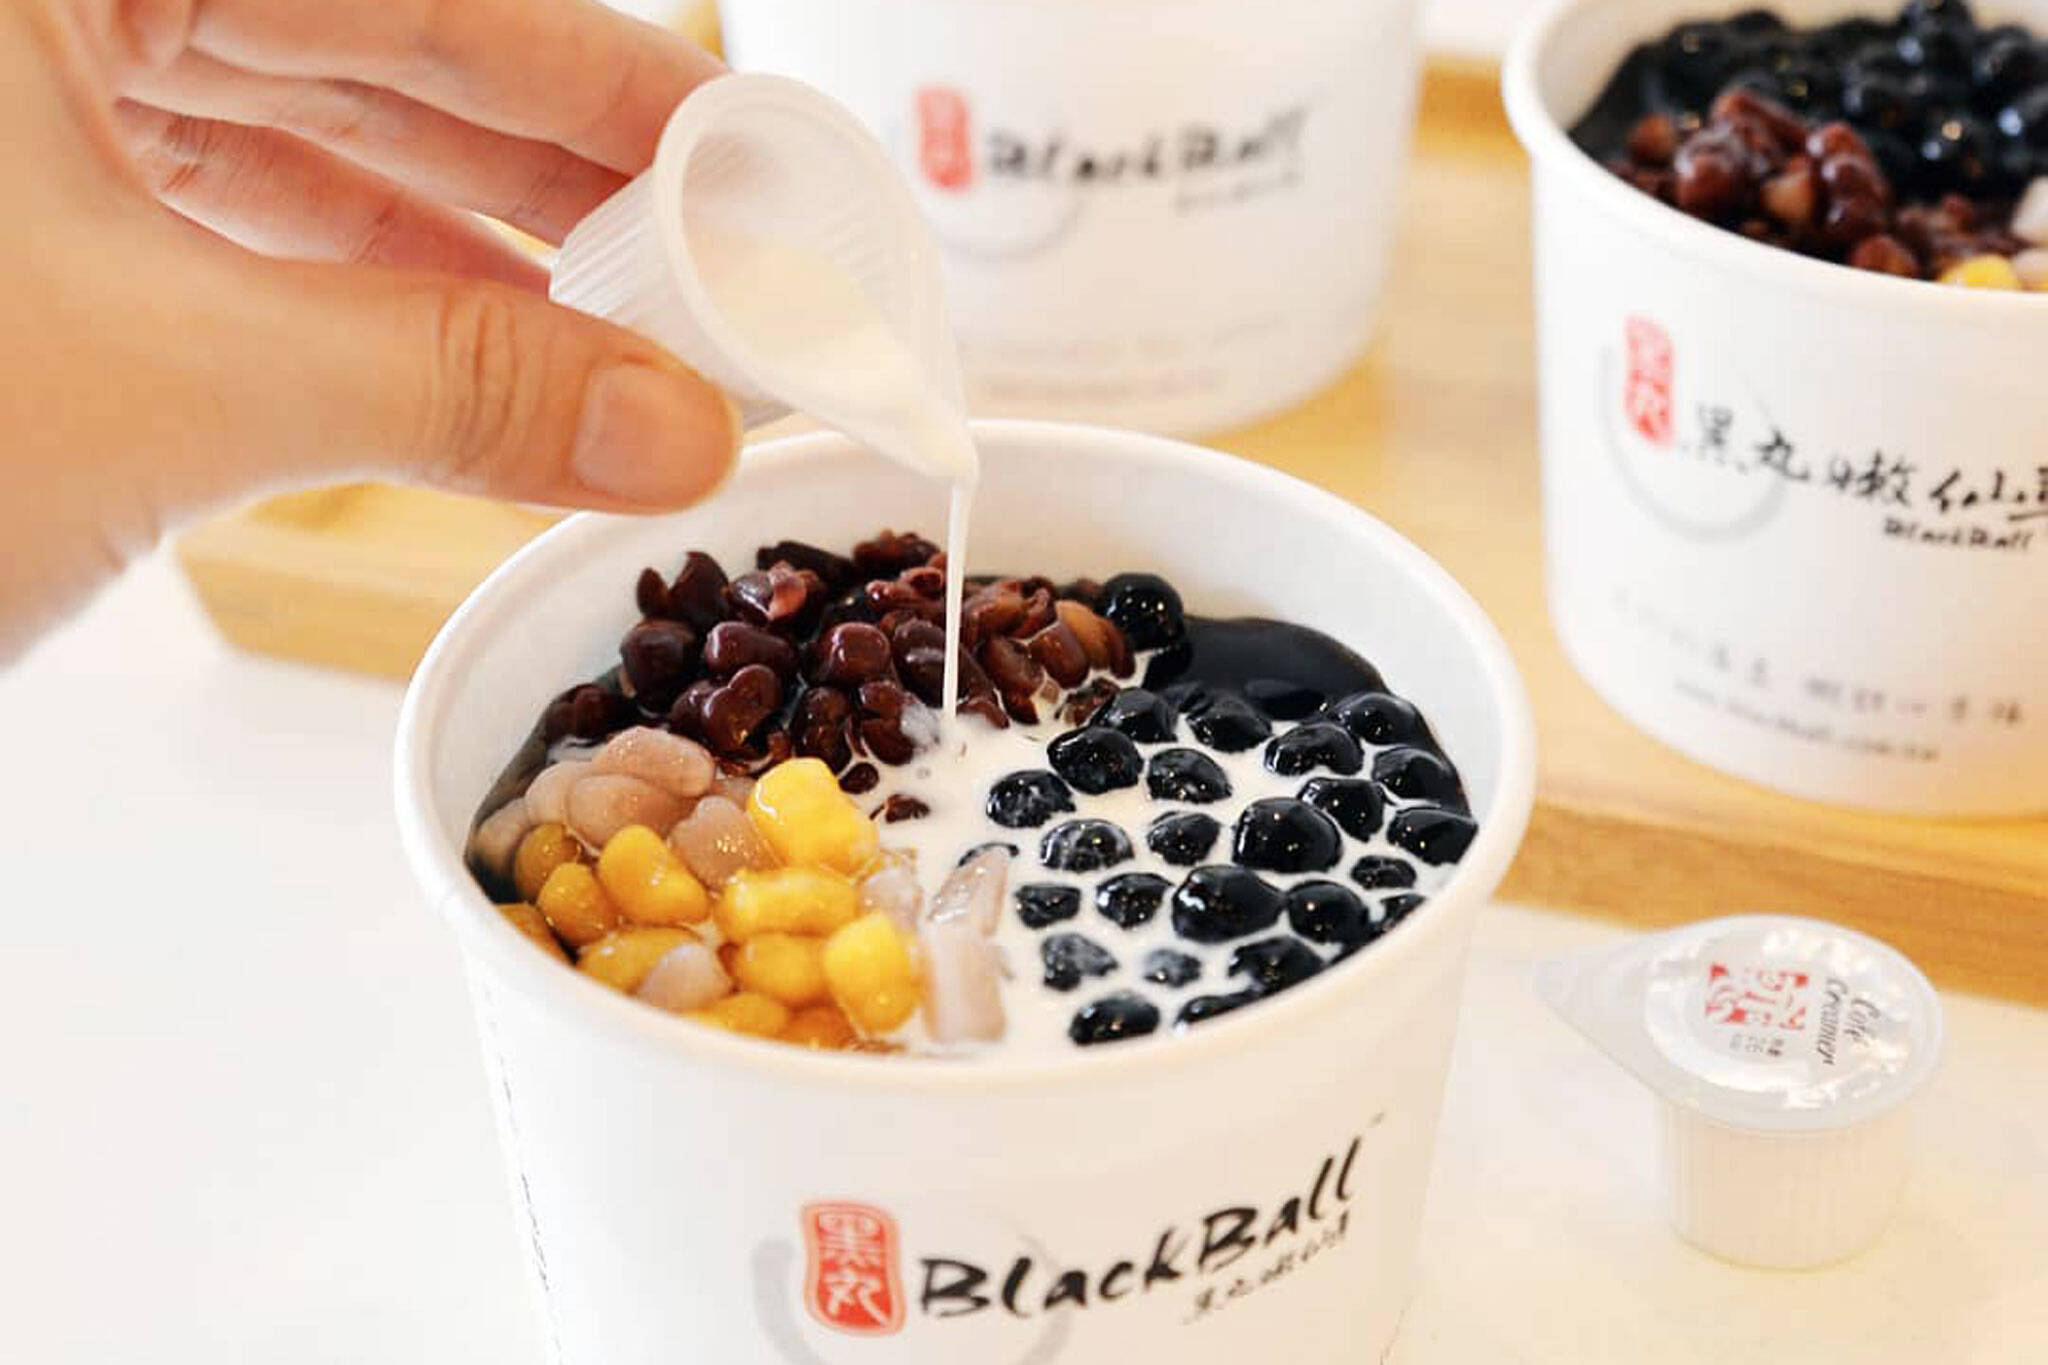 blackball dessert toronto